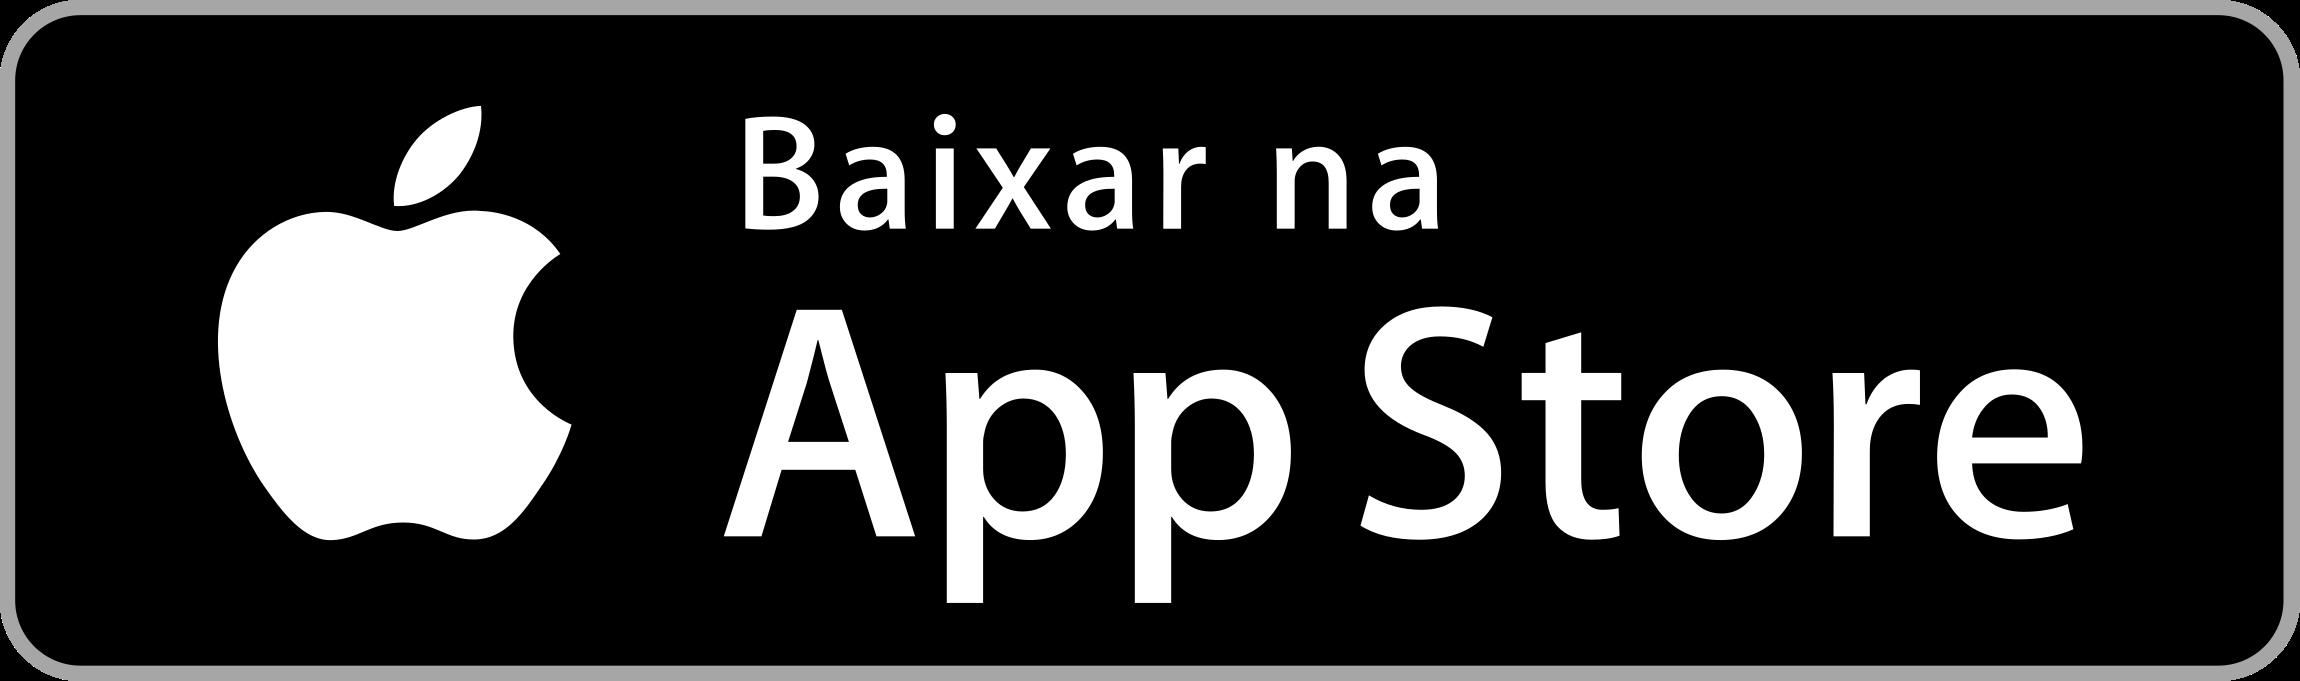 baixar-na-app-store-botao-1